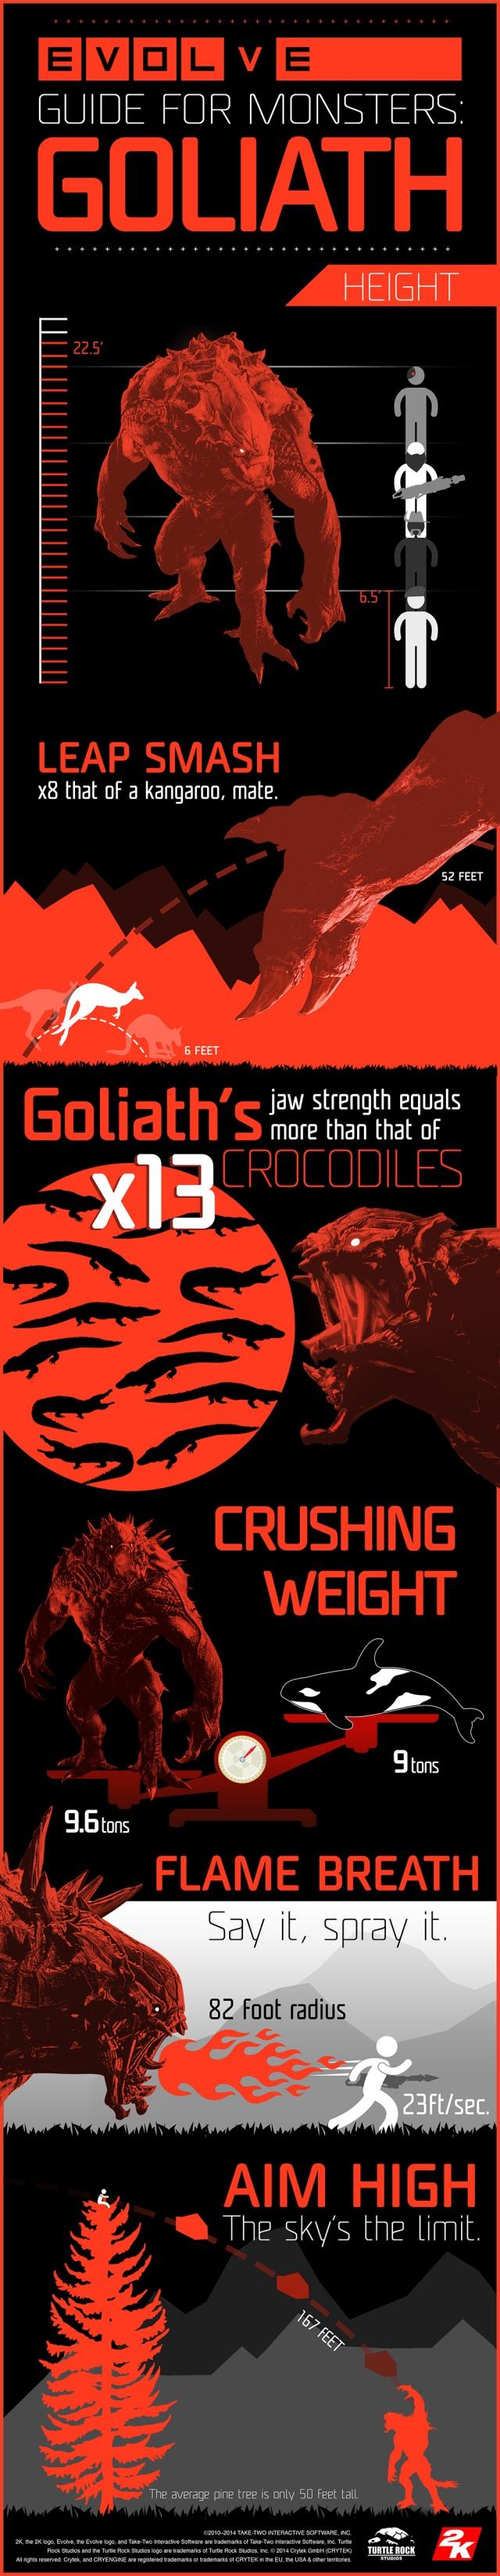 goliath_infographic_lg